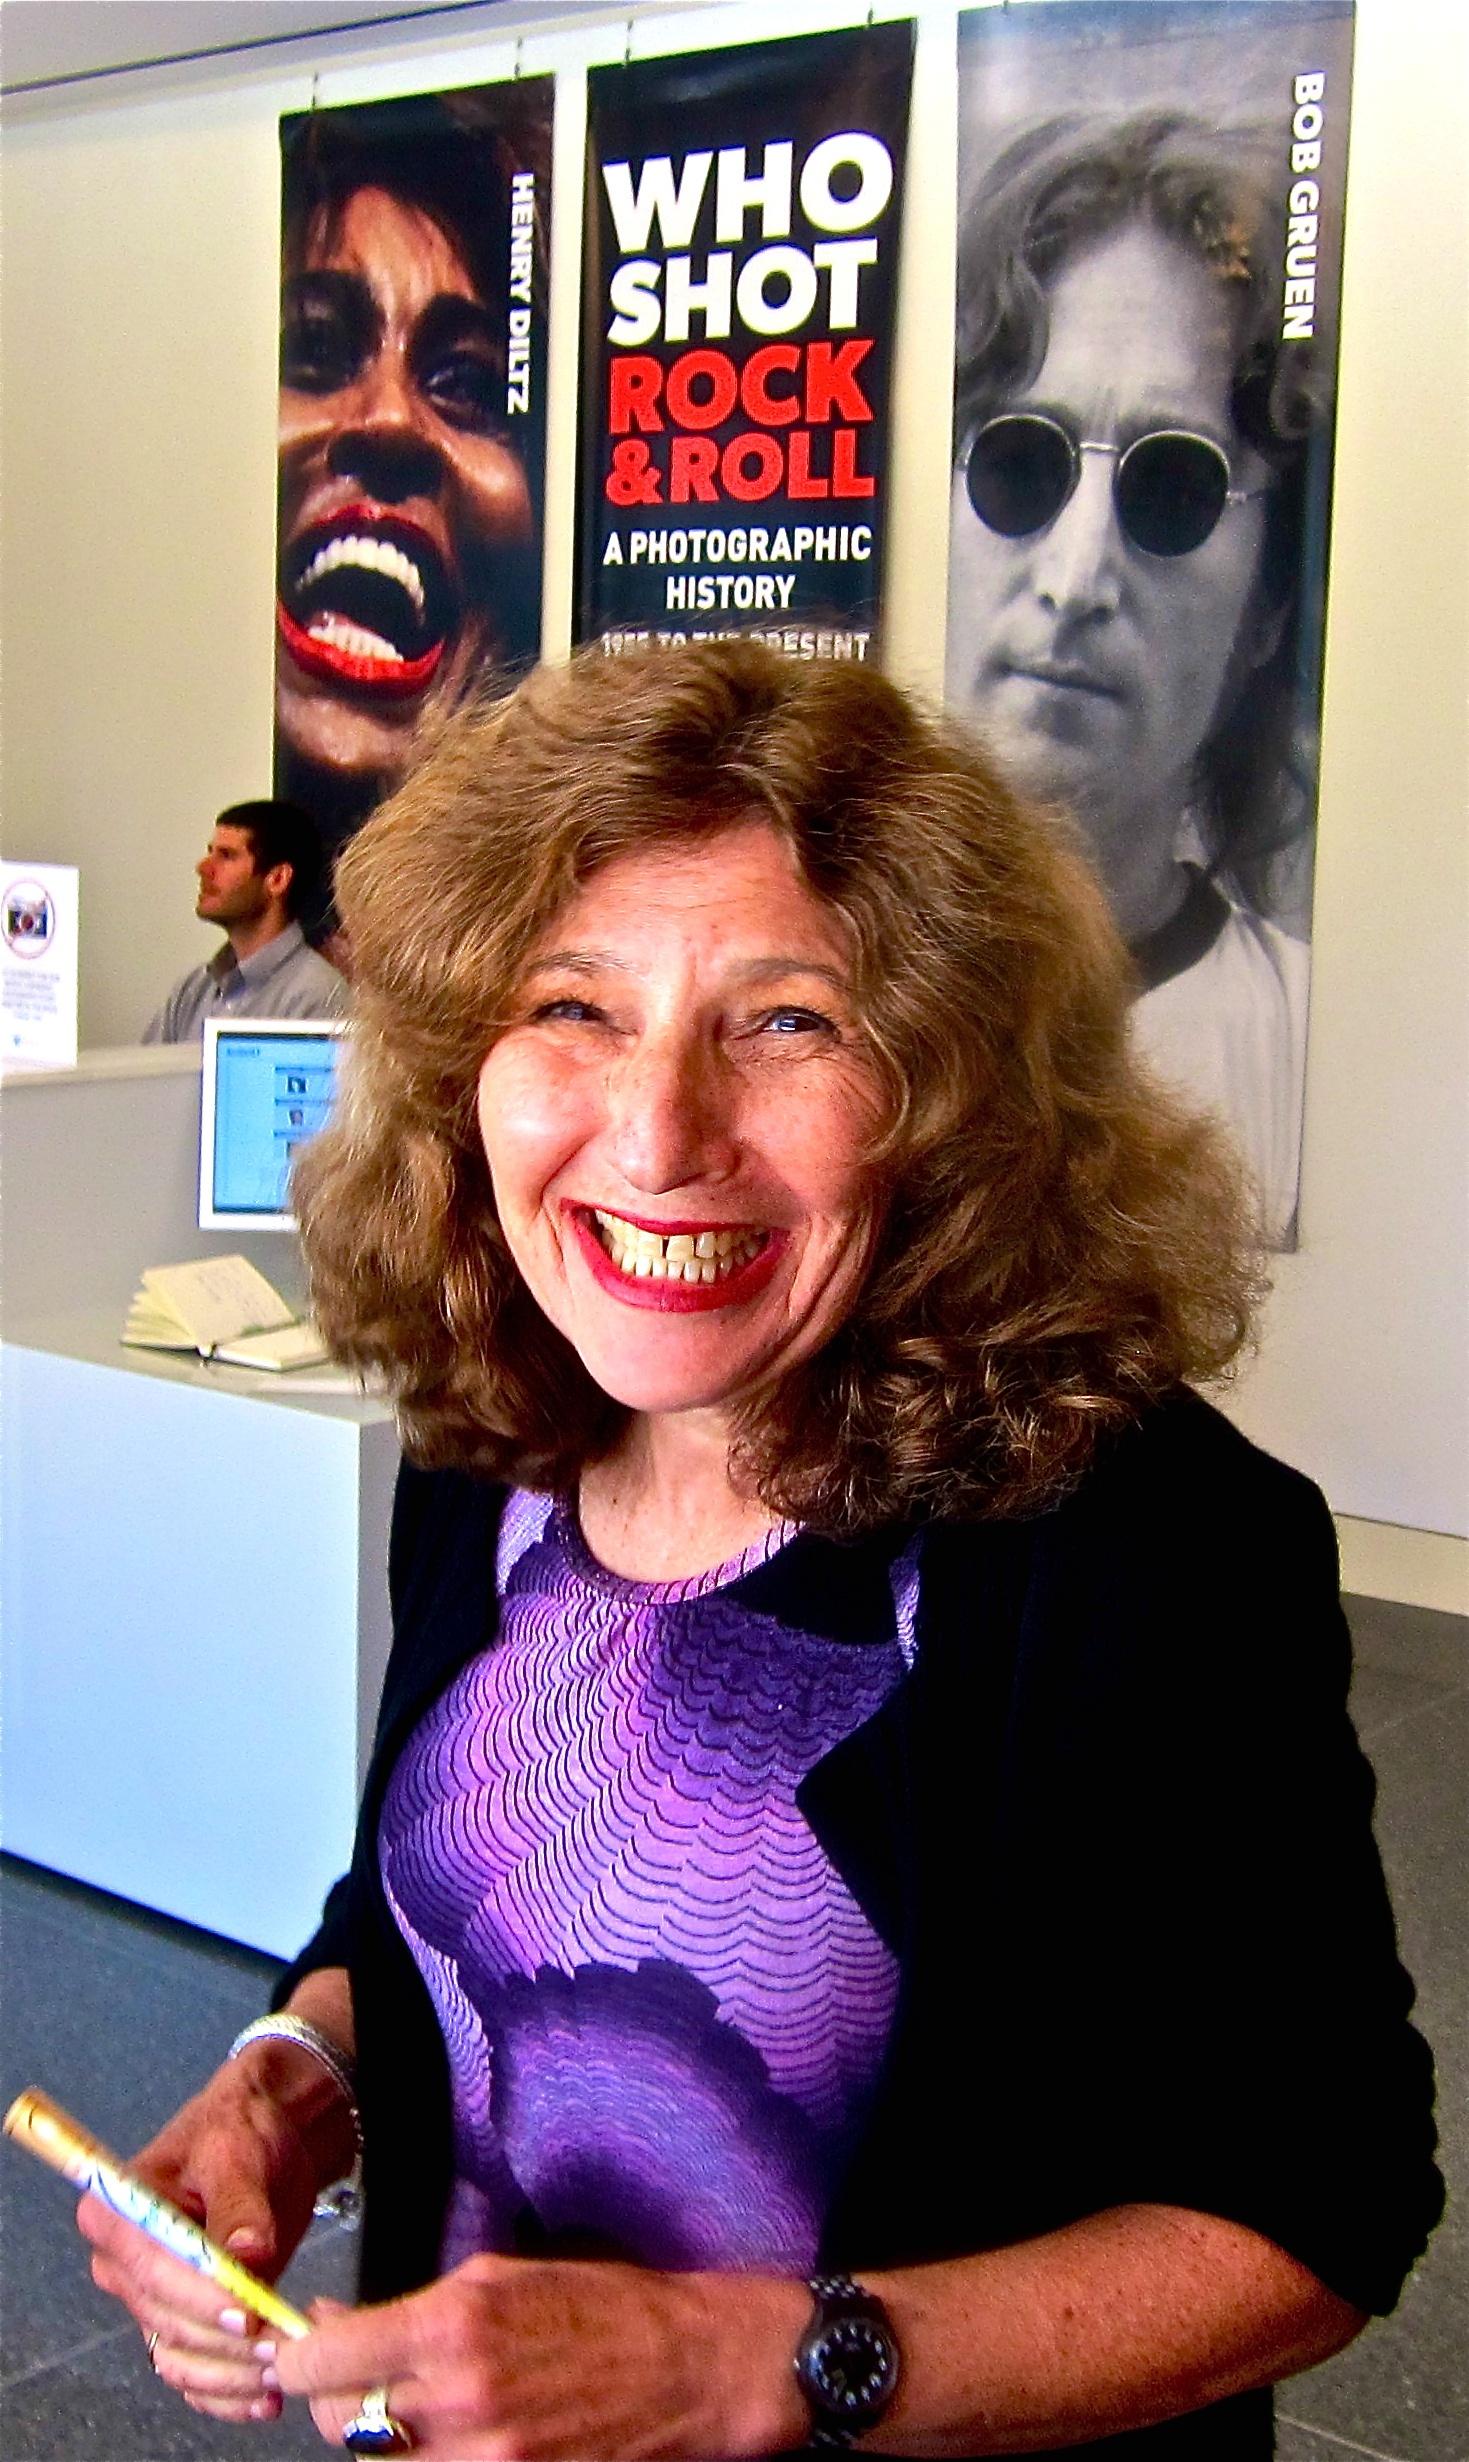 Curator Gail Buckland